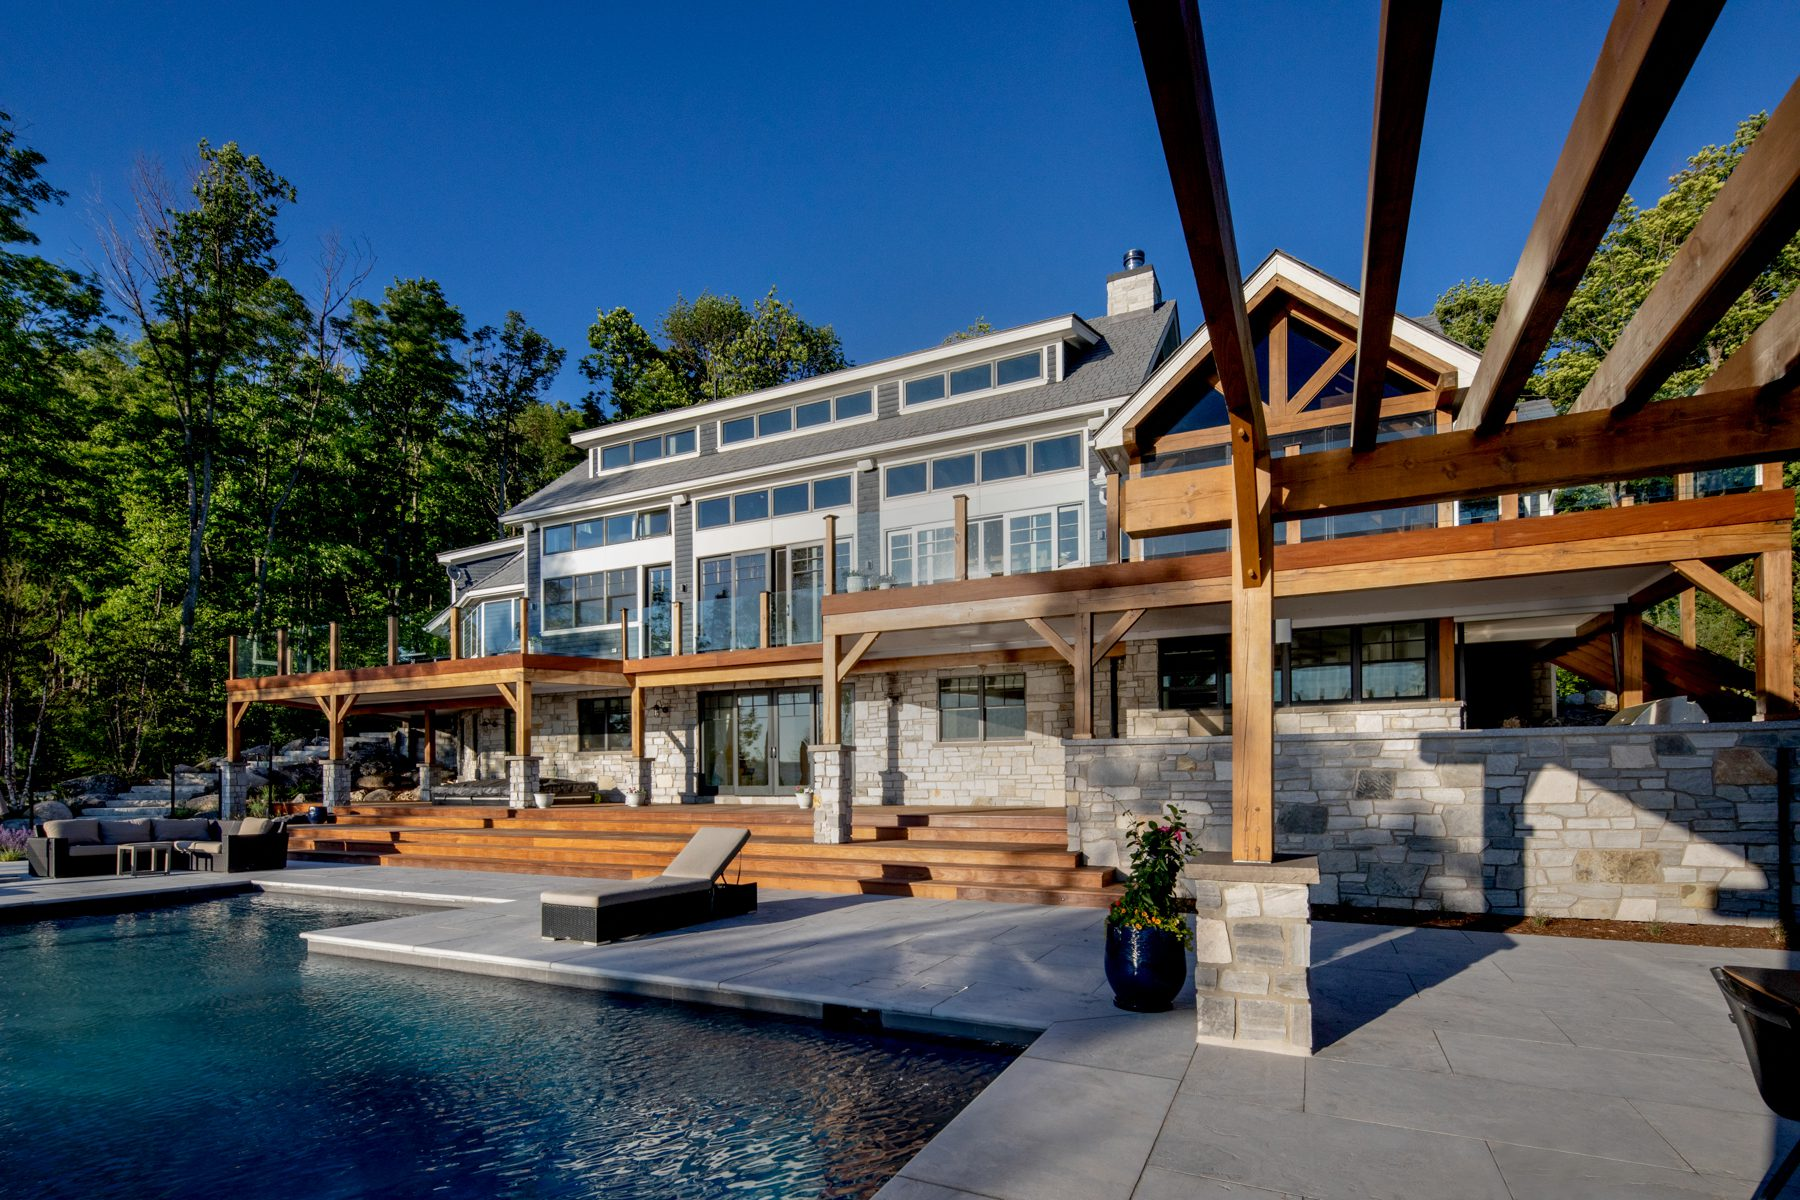 Normerica-Timber-Homes-Timber-Frame-Portfolio-Beachside-Bliss-Exterior-Rear-View-Pool